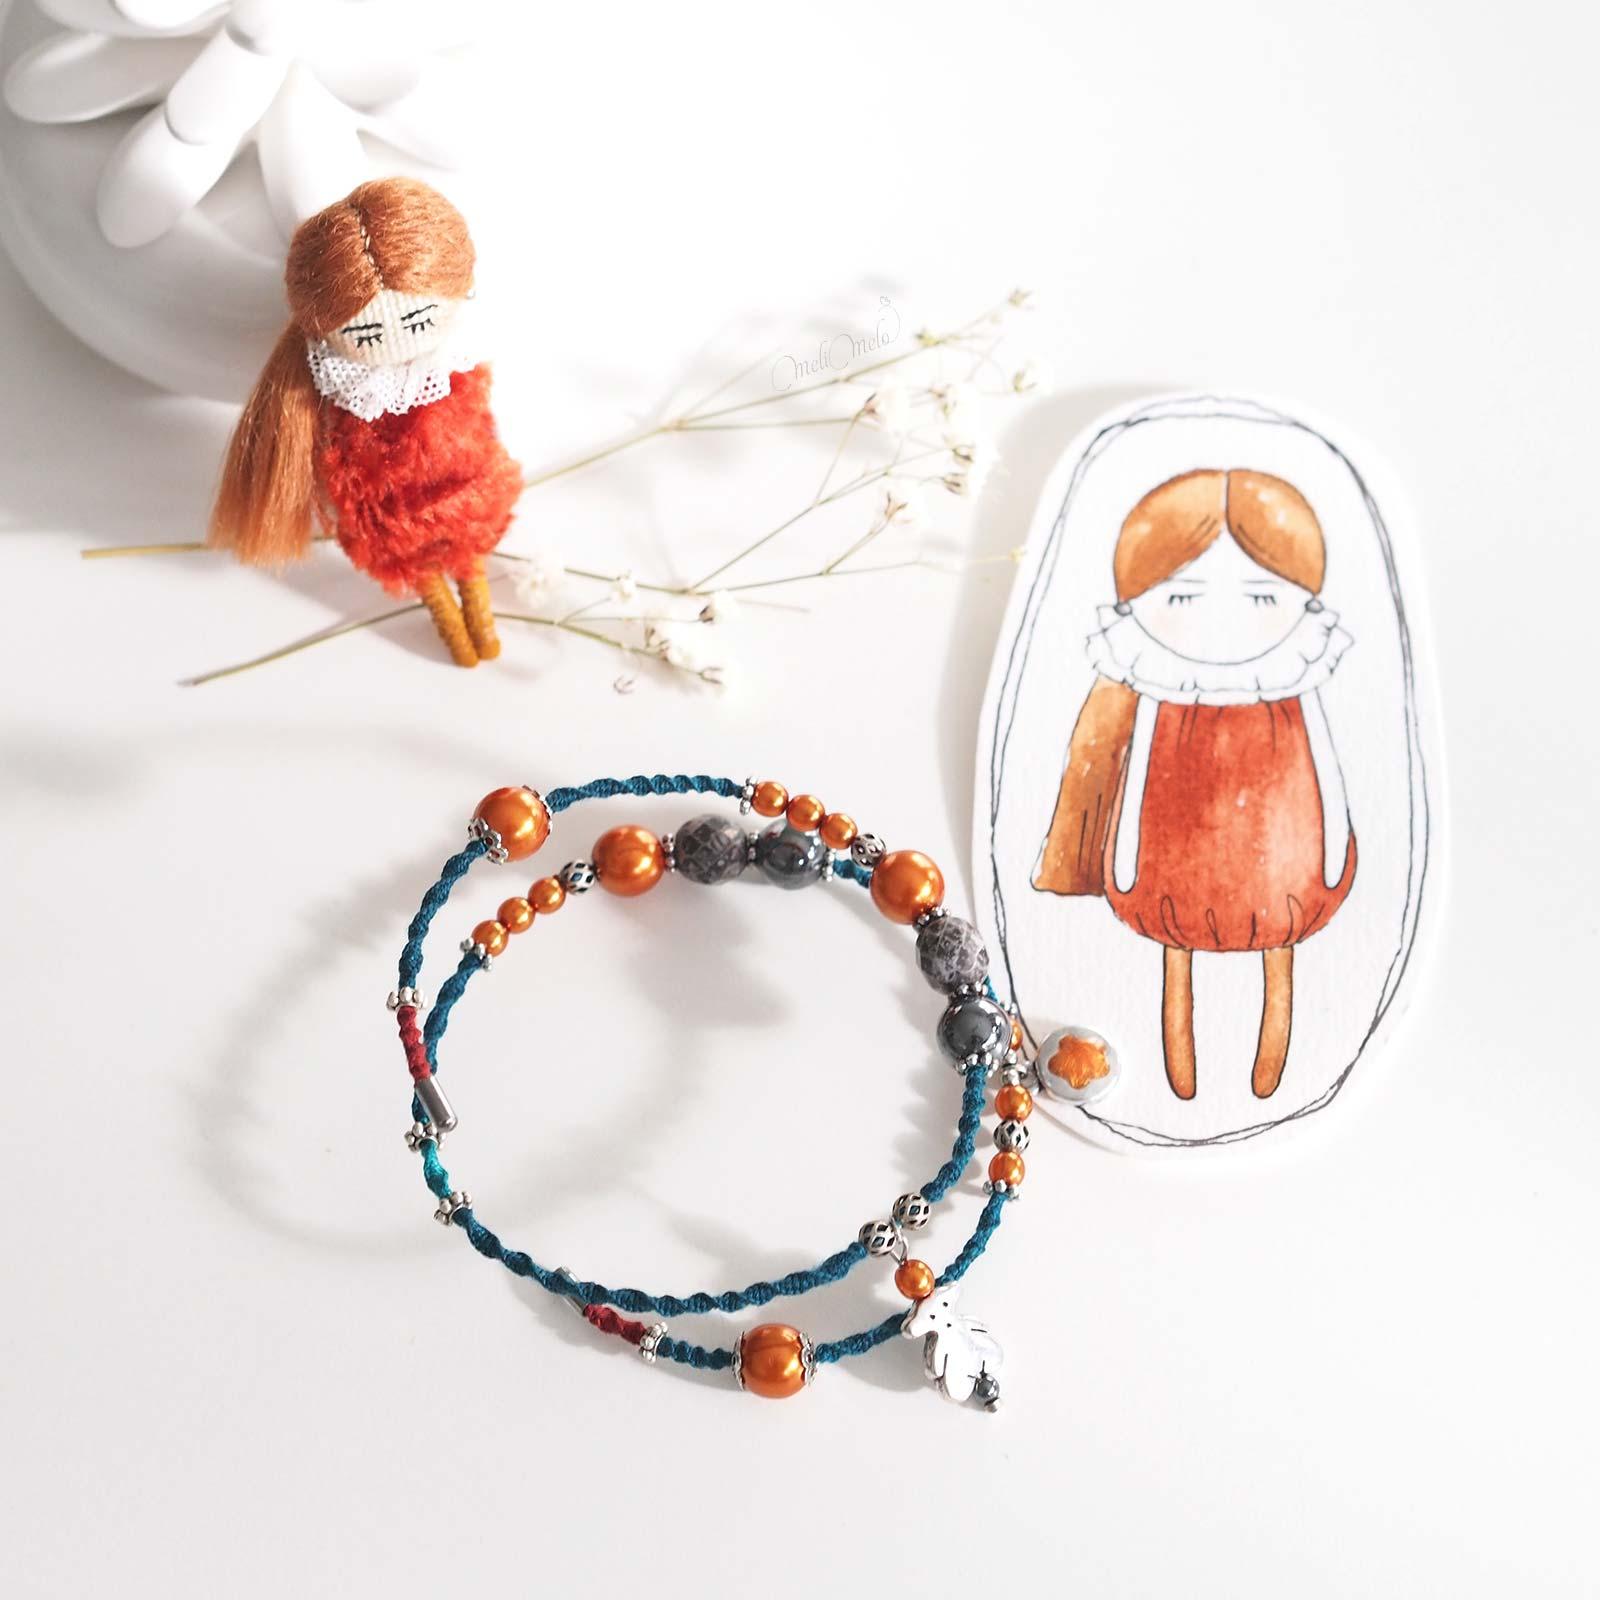 duo teal tangerine bracelet Cristal Swarovski nacré rose Hématite broche poupée laboutiquedemelimelo